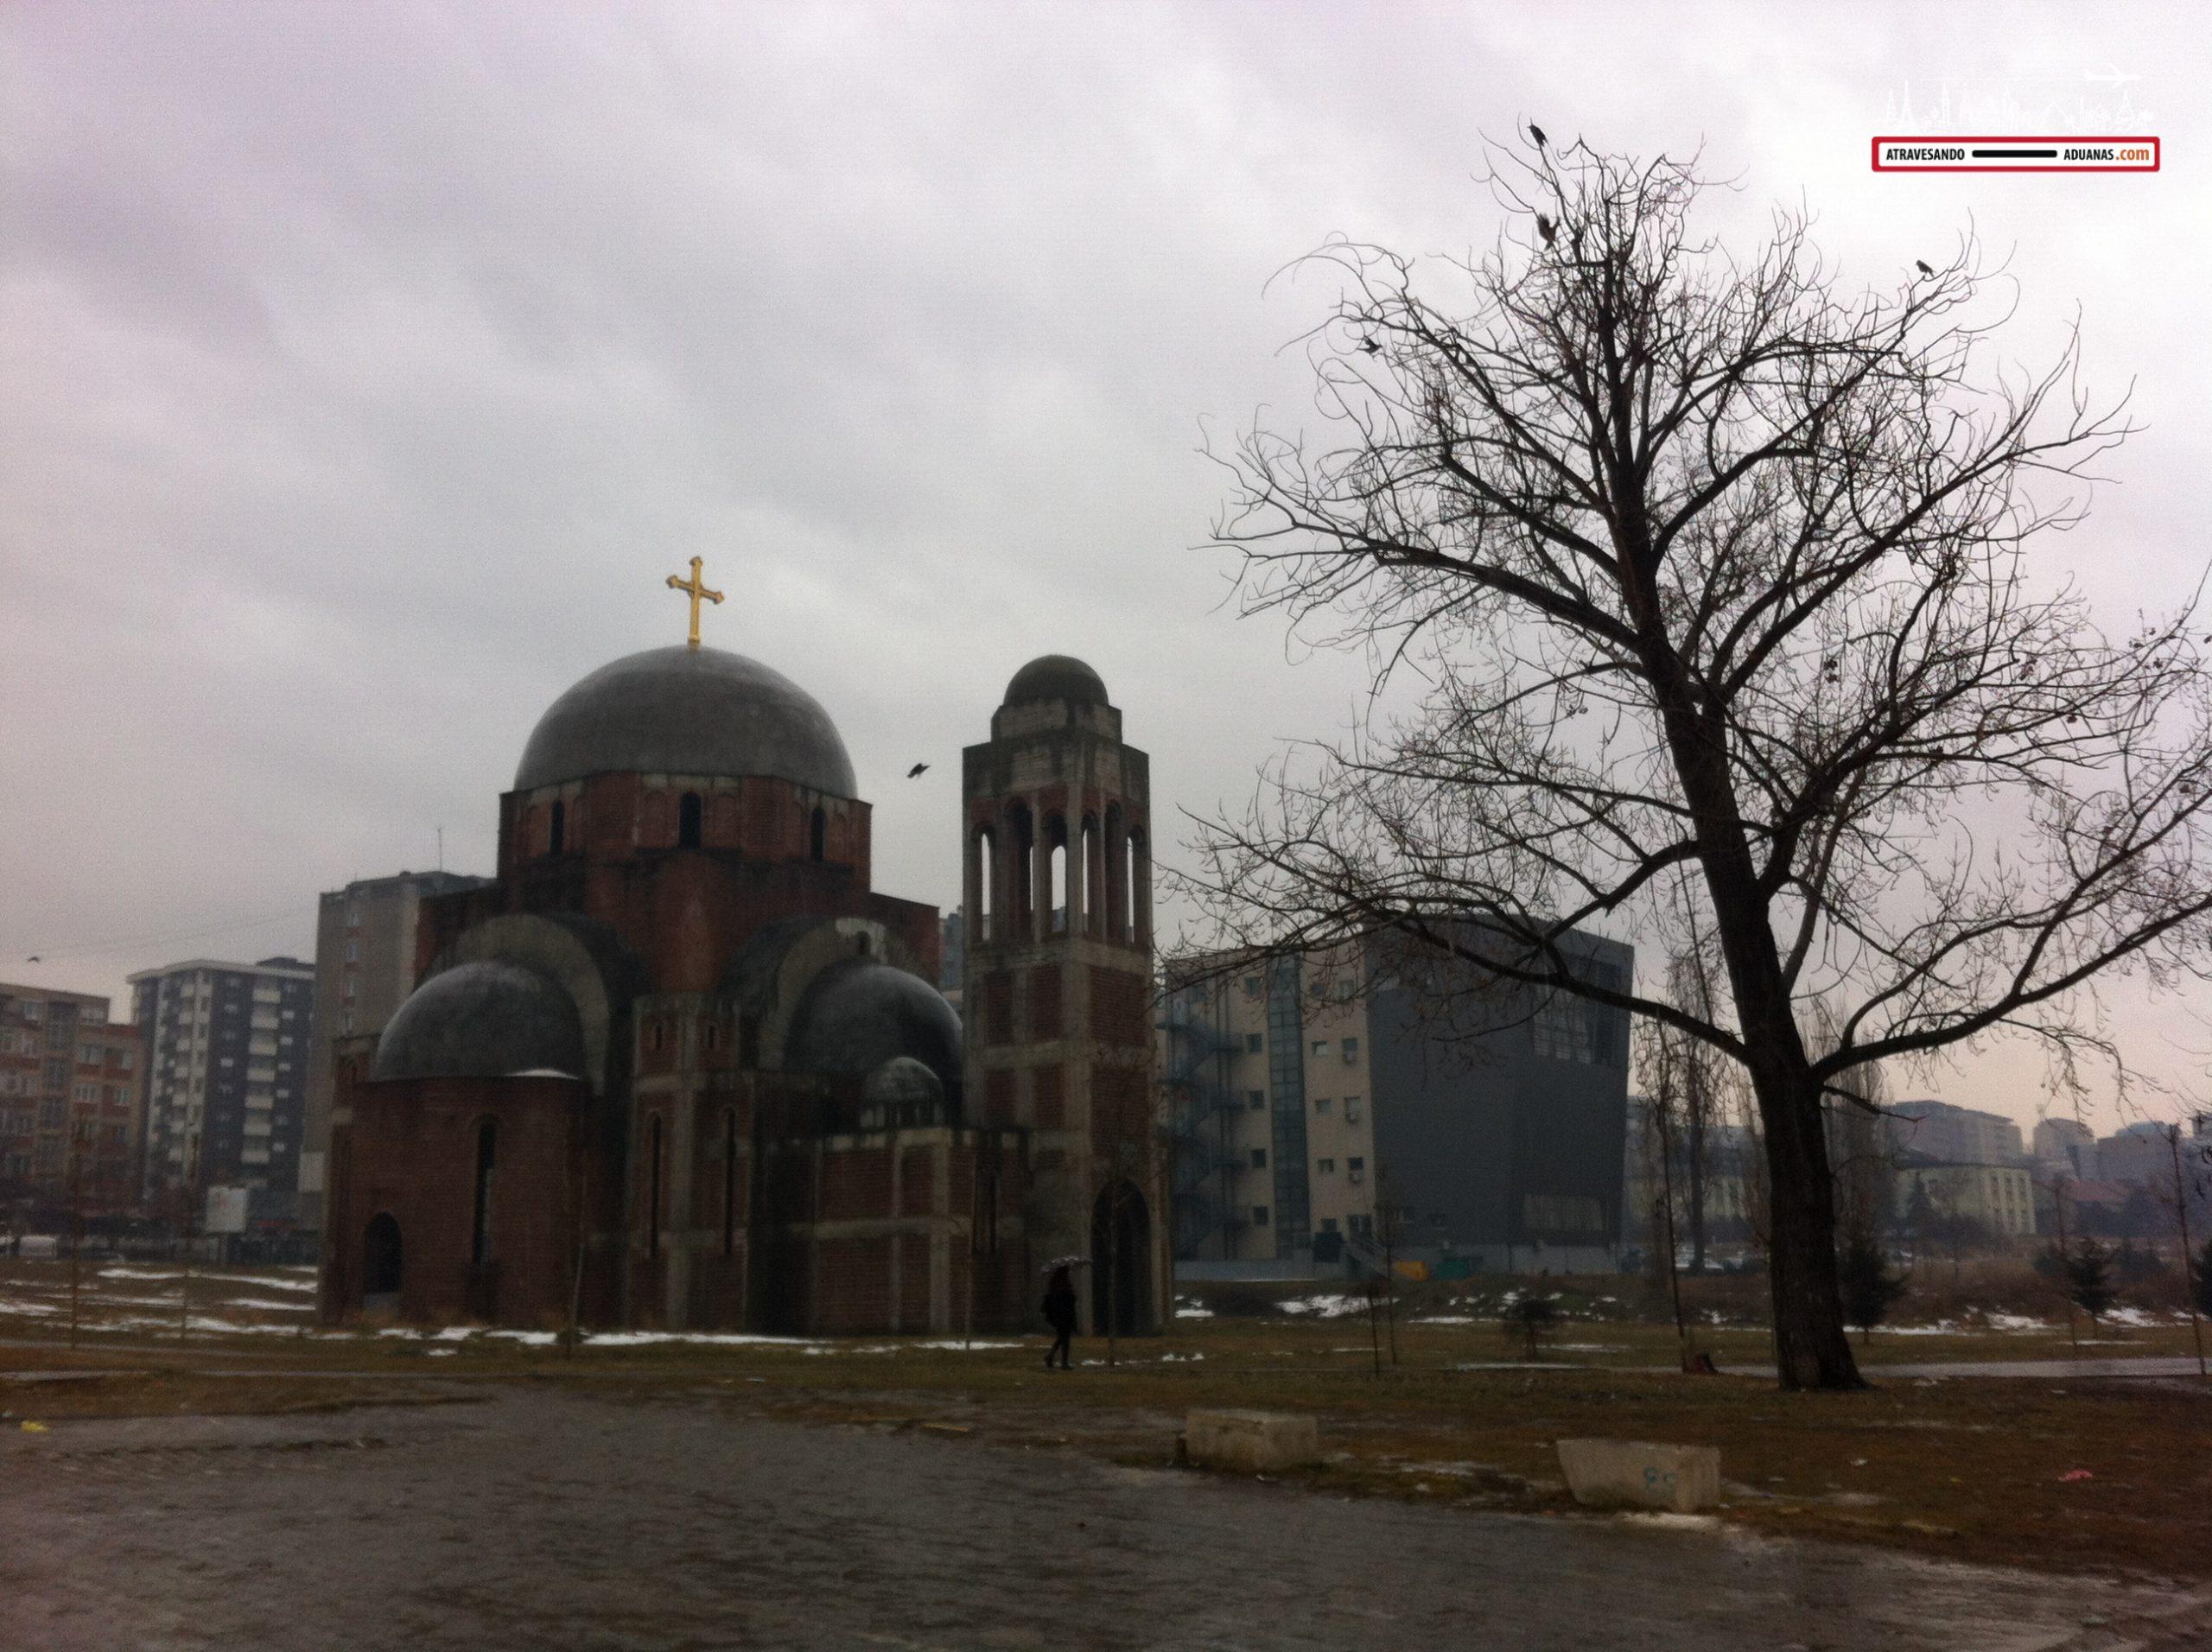 Iglesia en construccion en Prishtina